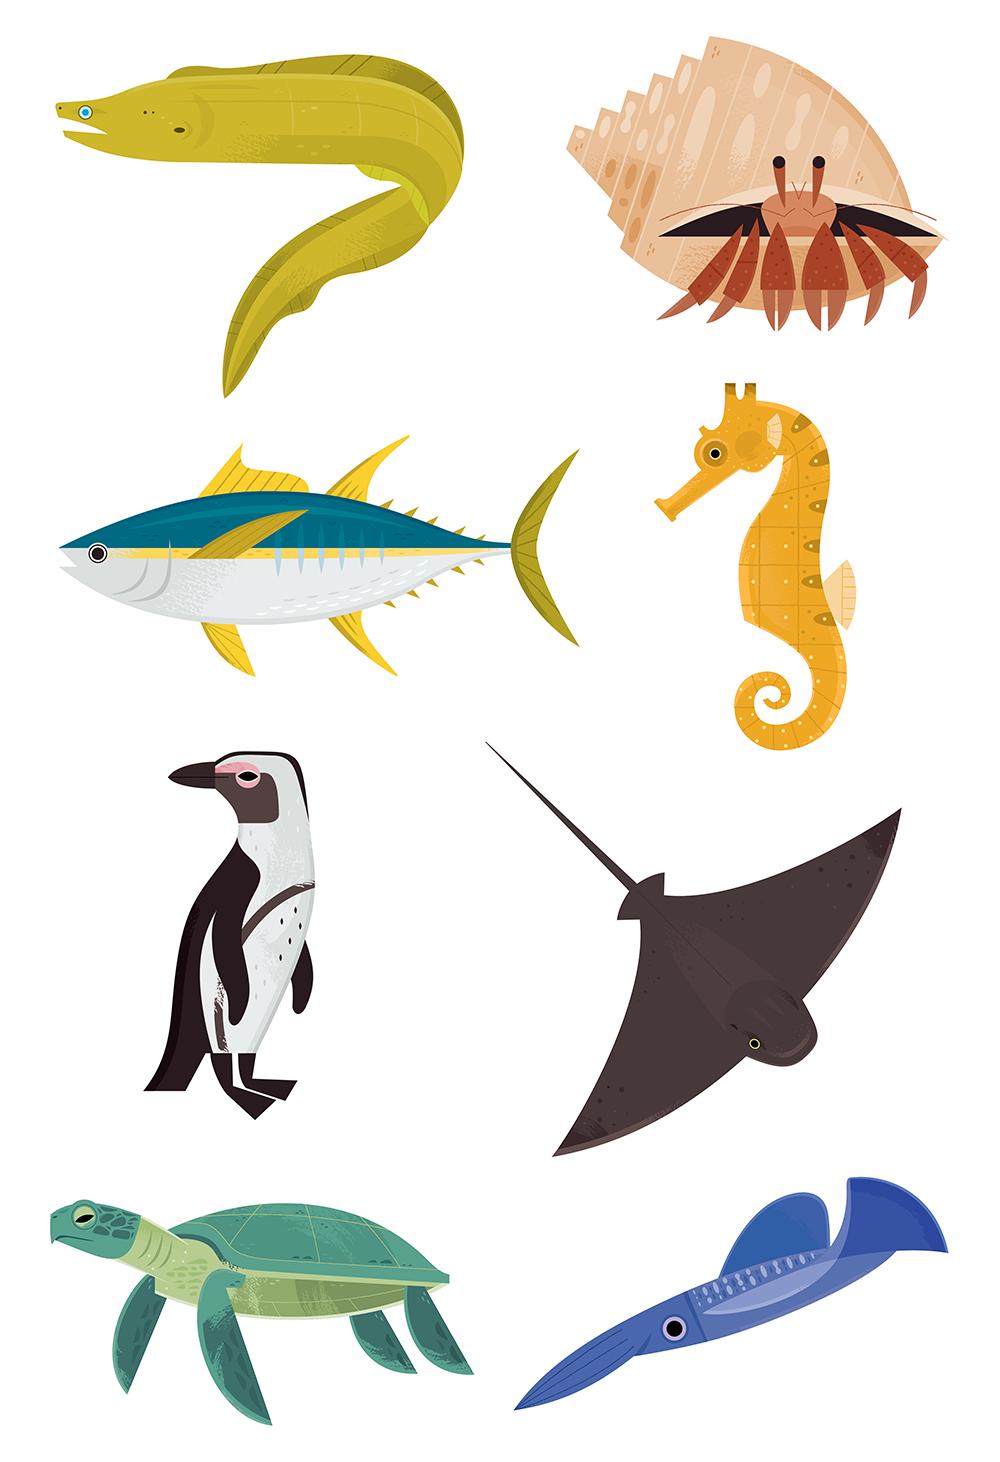 Monterey bay aquarium clipart jpg royalty free stock Monterey Bay Aquarium Icons on Behance jpg royalty free stock